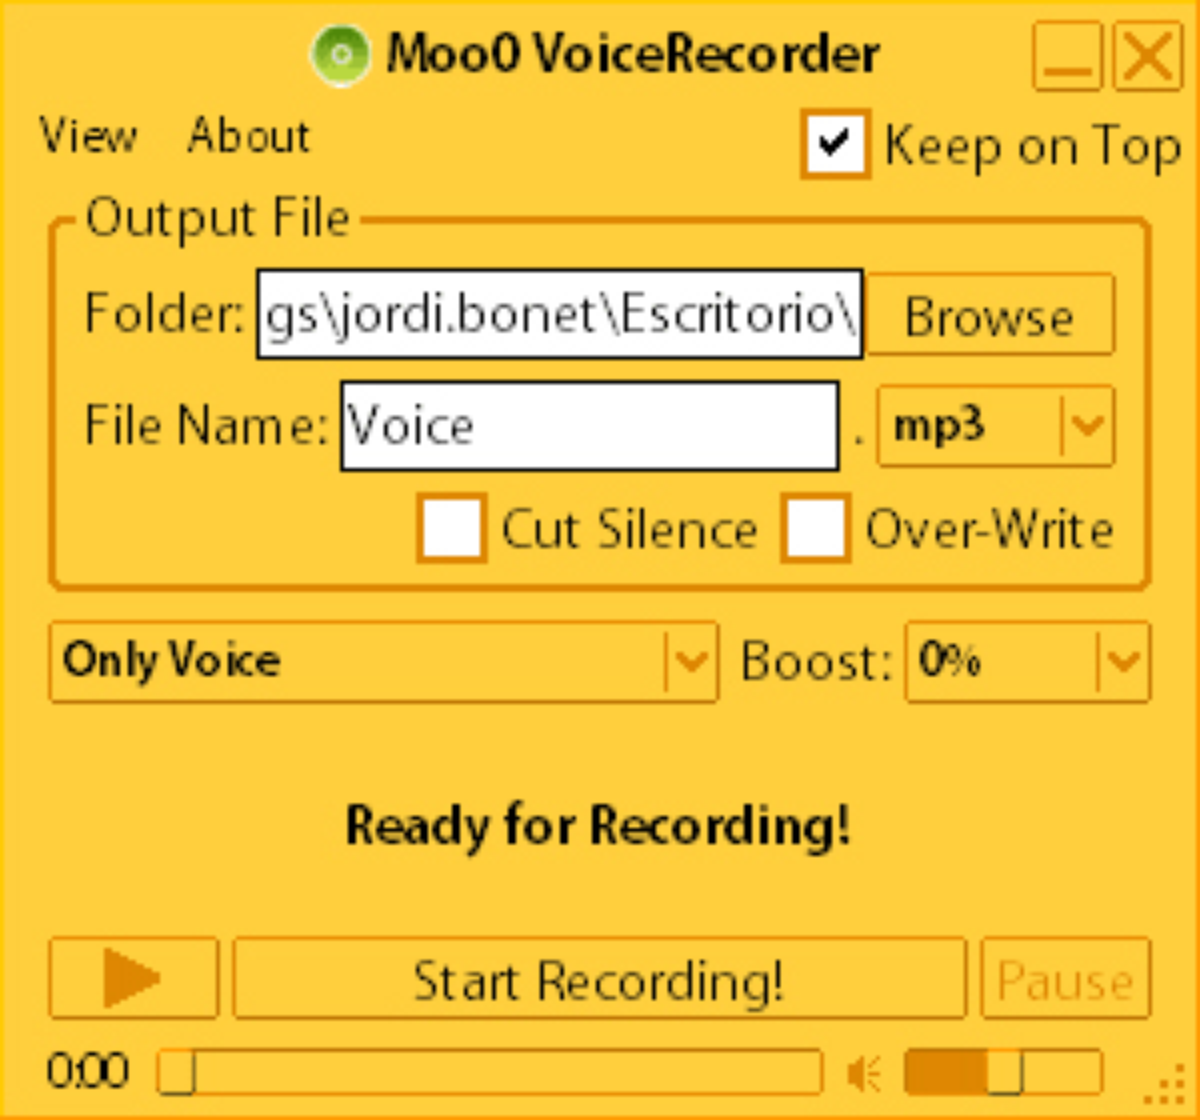 Moo0 VoiceRecorder